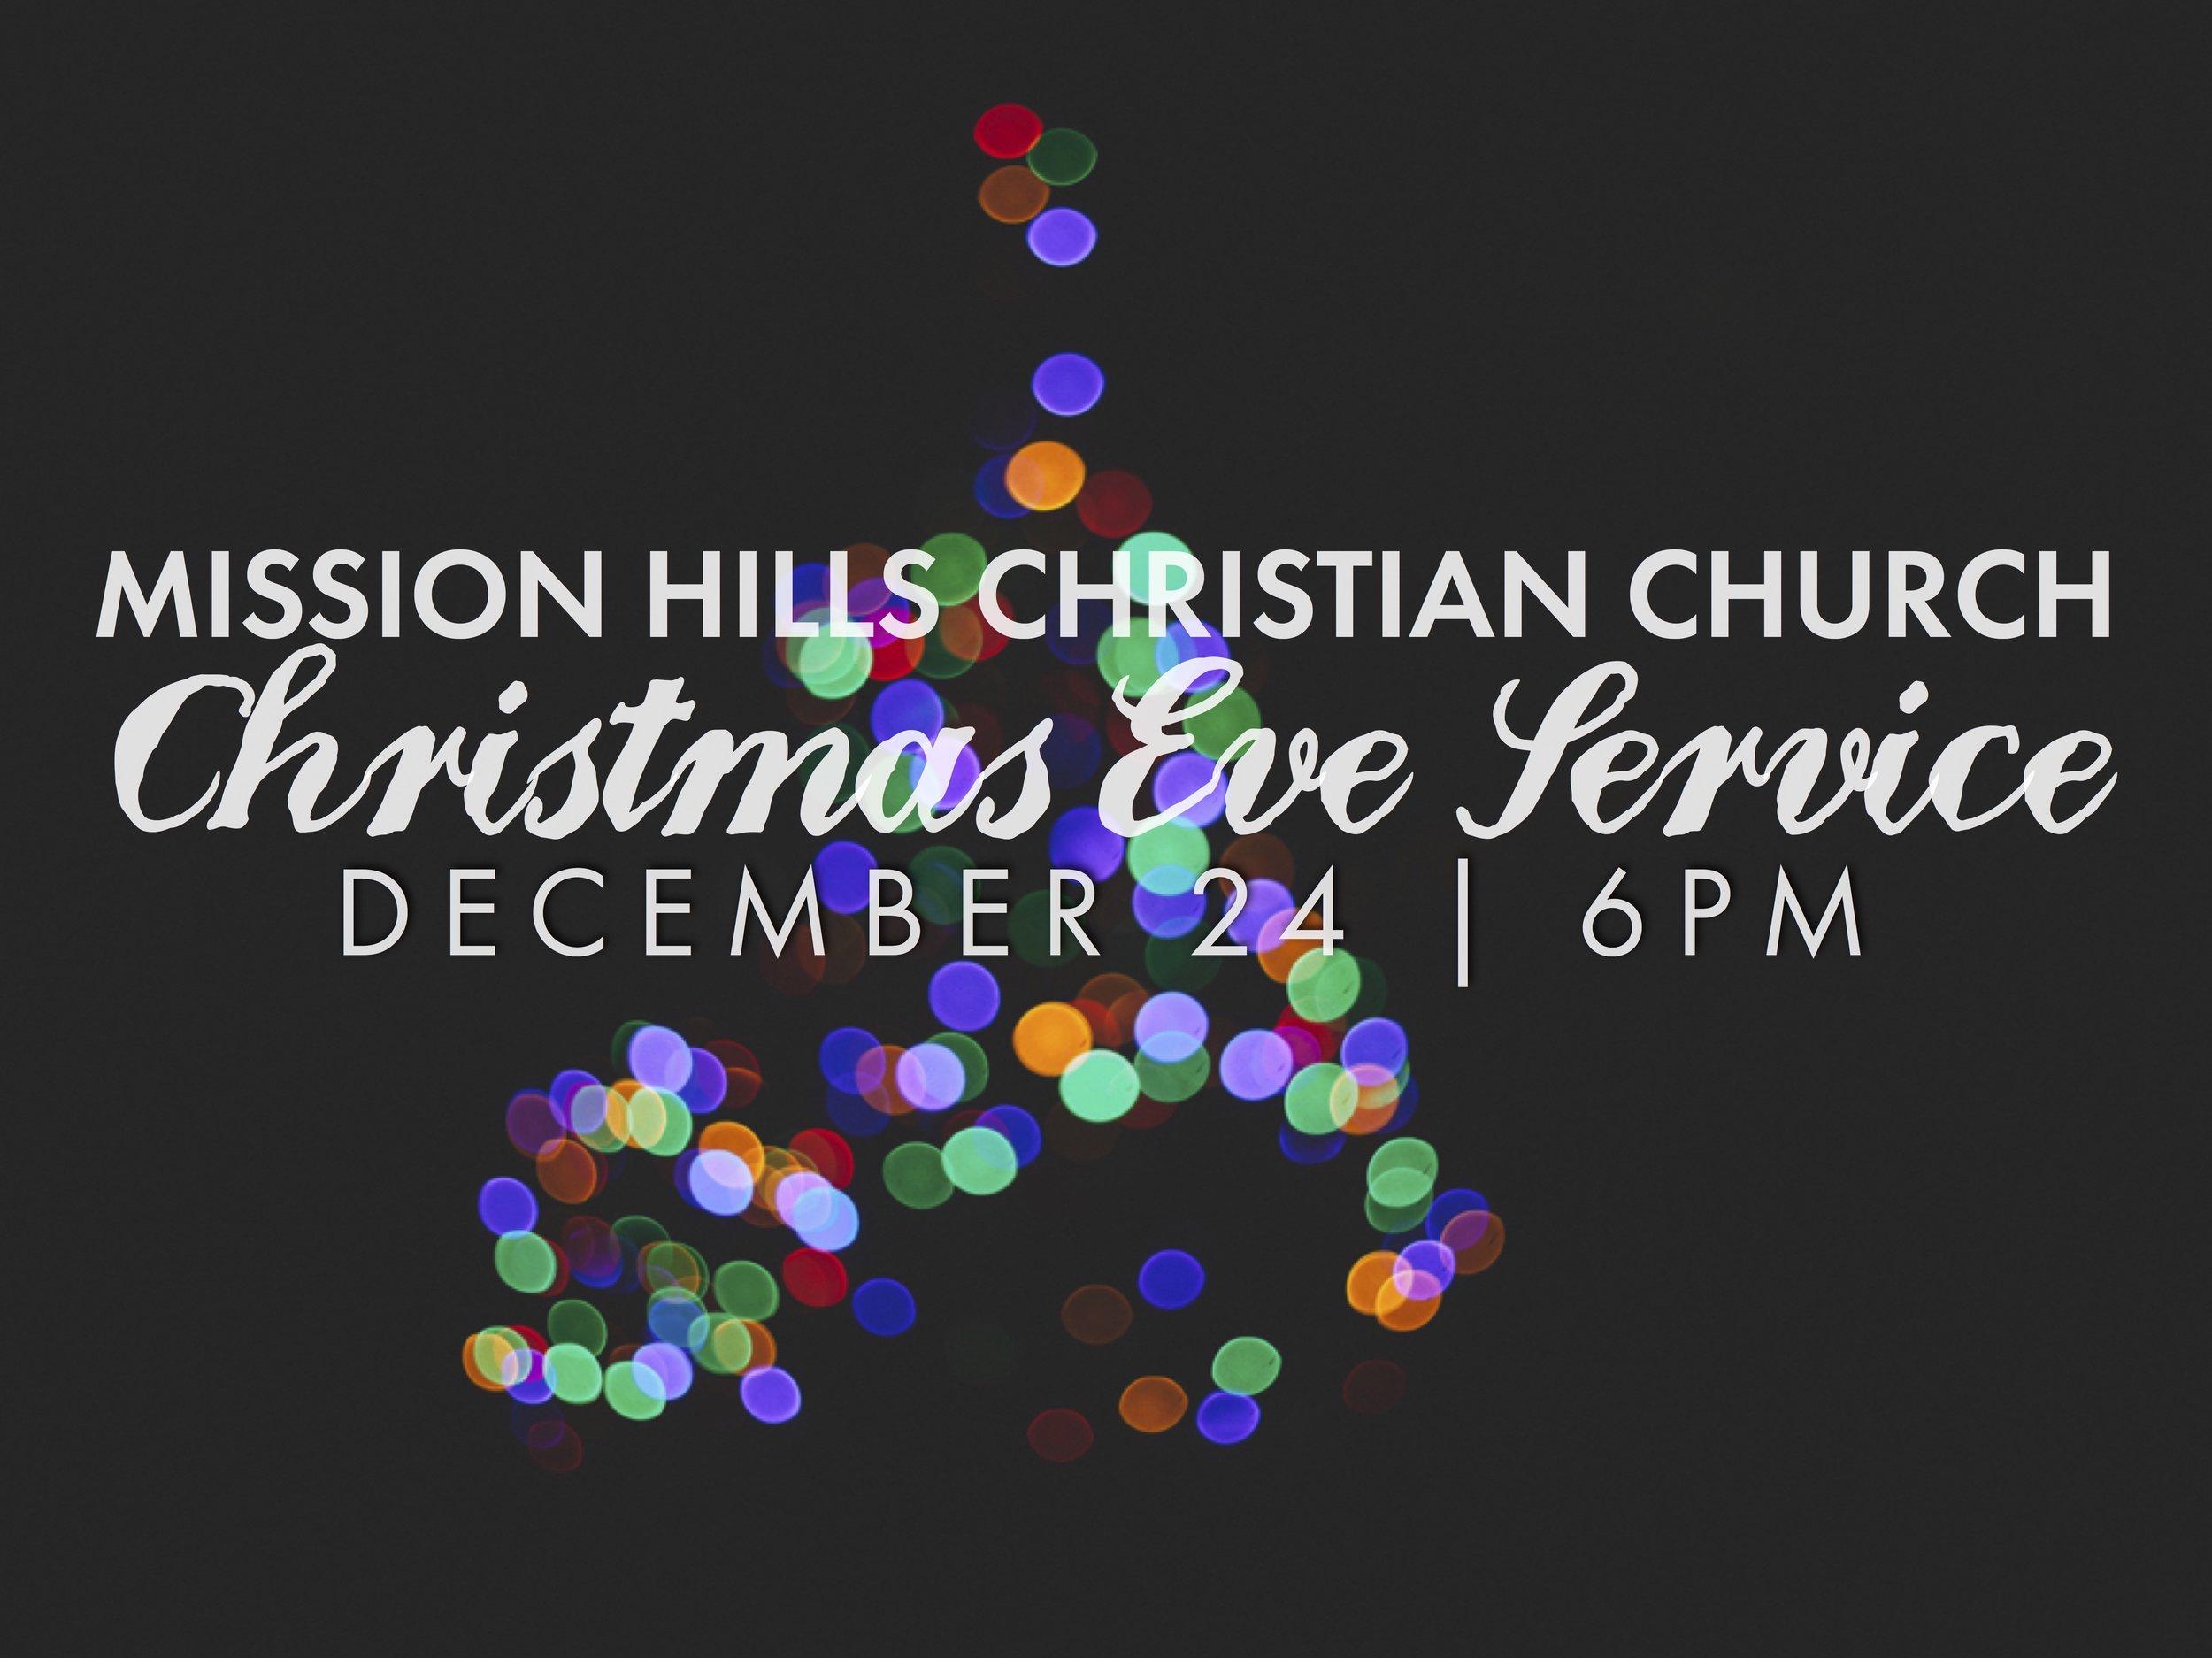 mission-hills-christian-church-christmas-eve-los-angeles.jpg